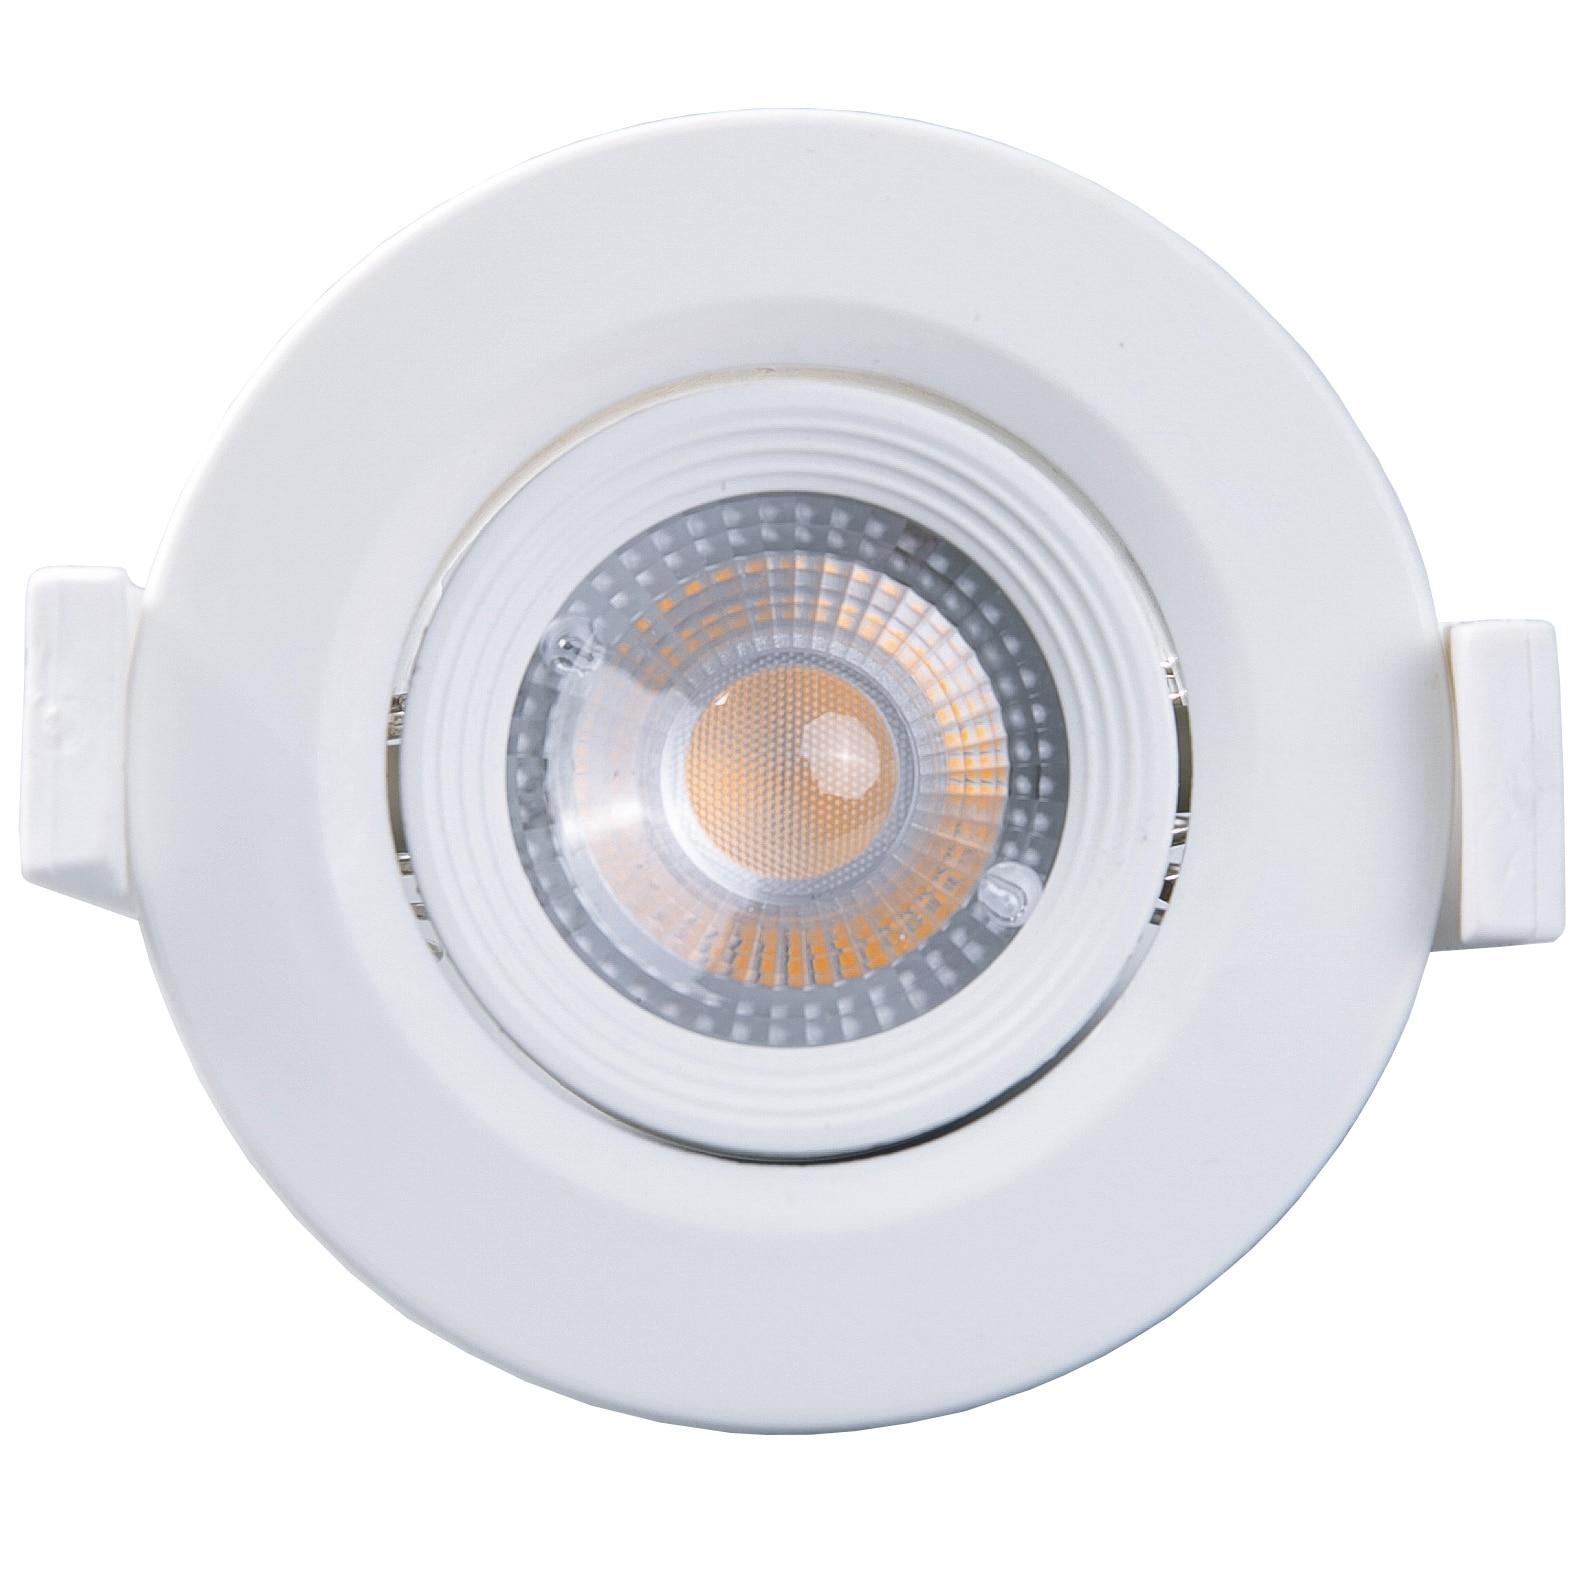 Fotografie Spot LED incastrabil Well Glamor, rotund, 3W, 240 lm, temperatura lumina 6500K, 60mm